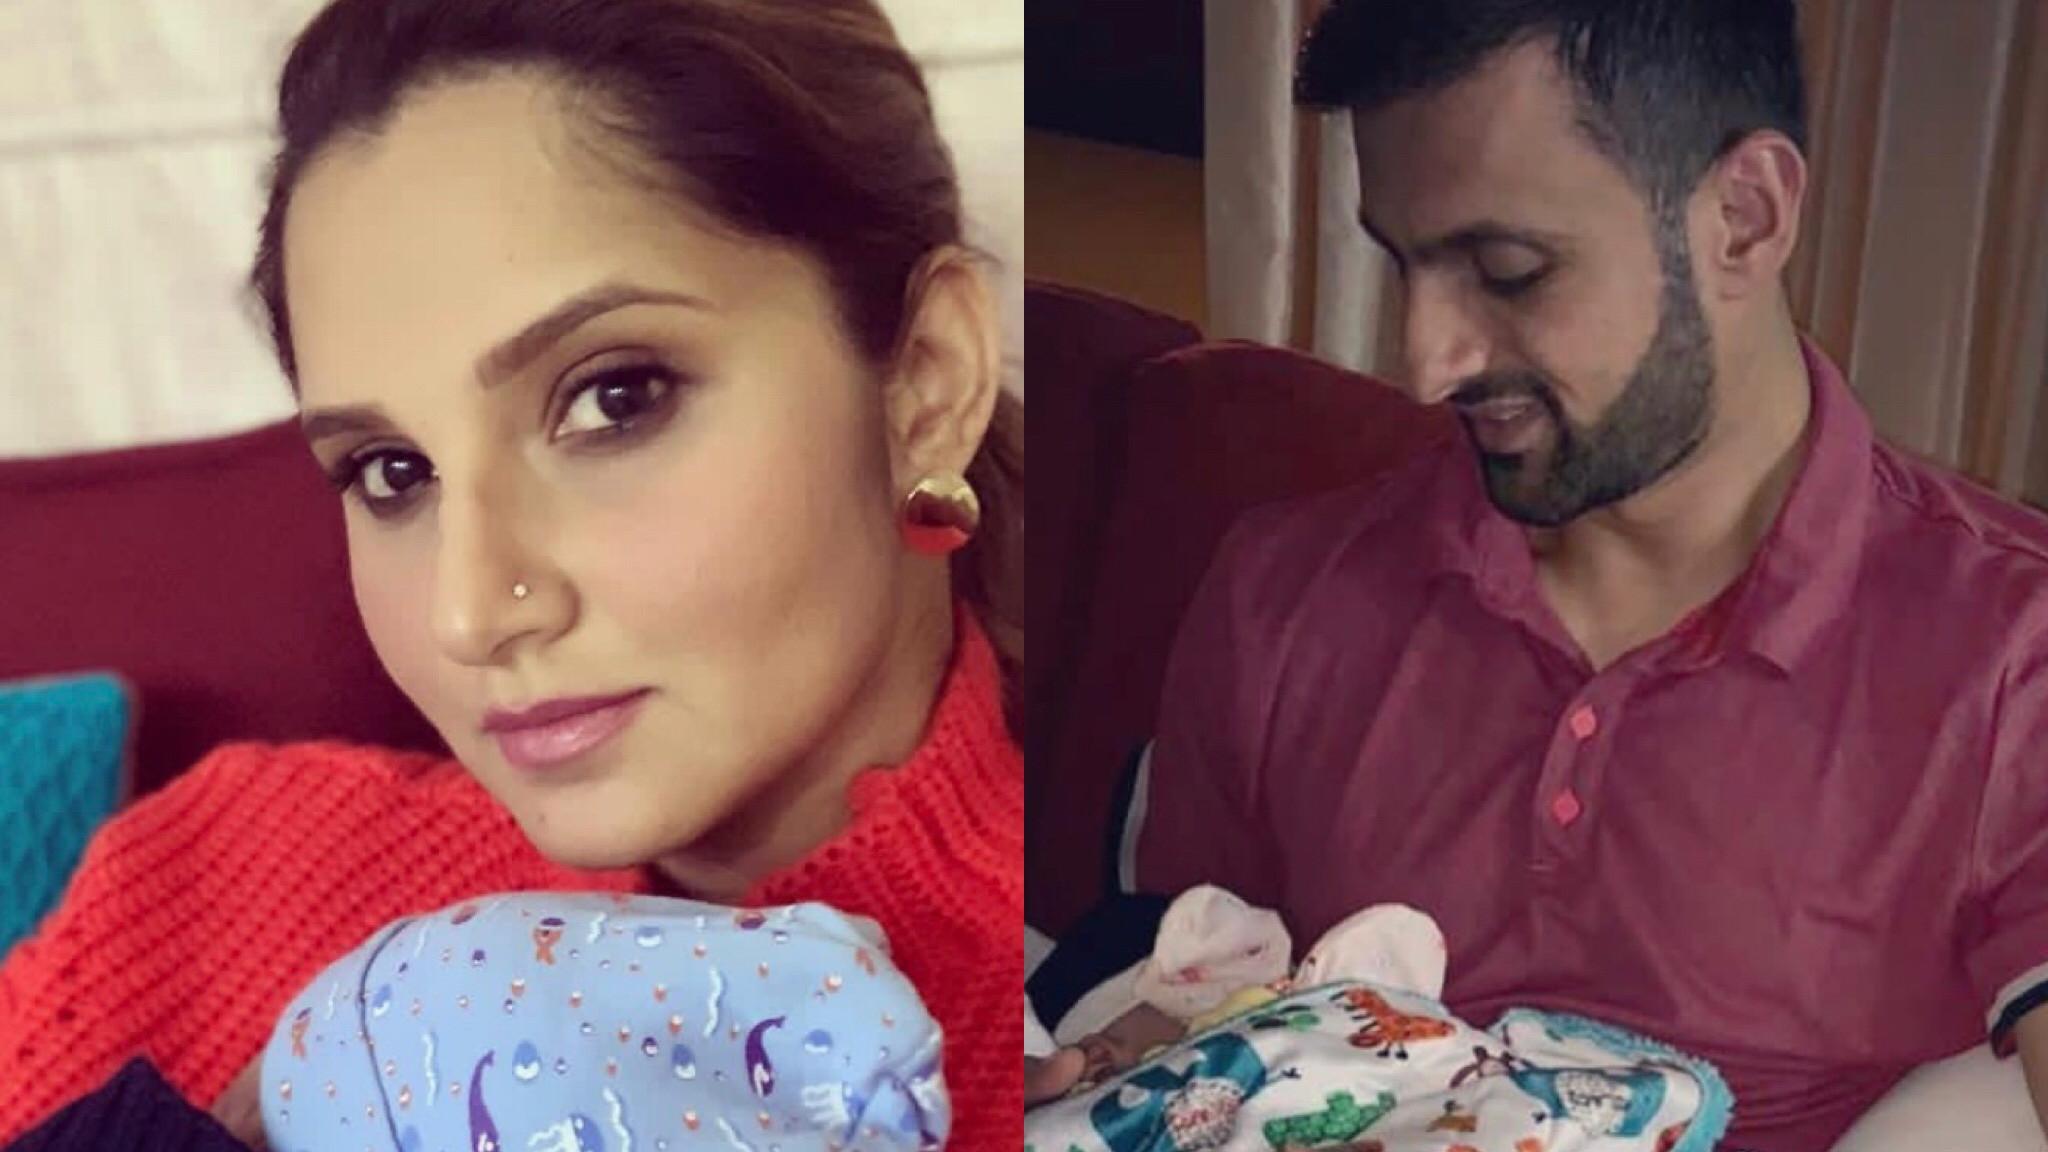 Shoaib Malik and Sania Mirza upload first picture of their son, Izhaan Mirza Malik